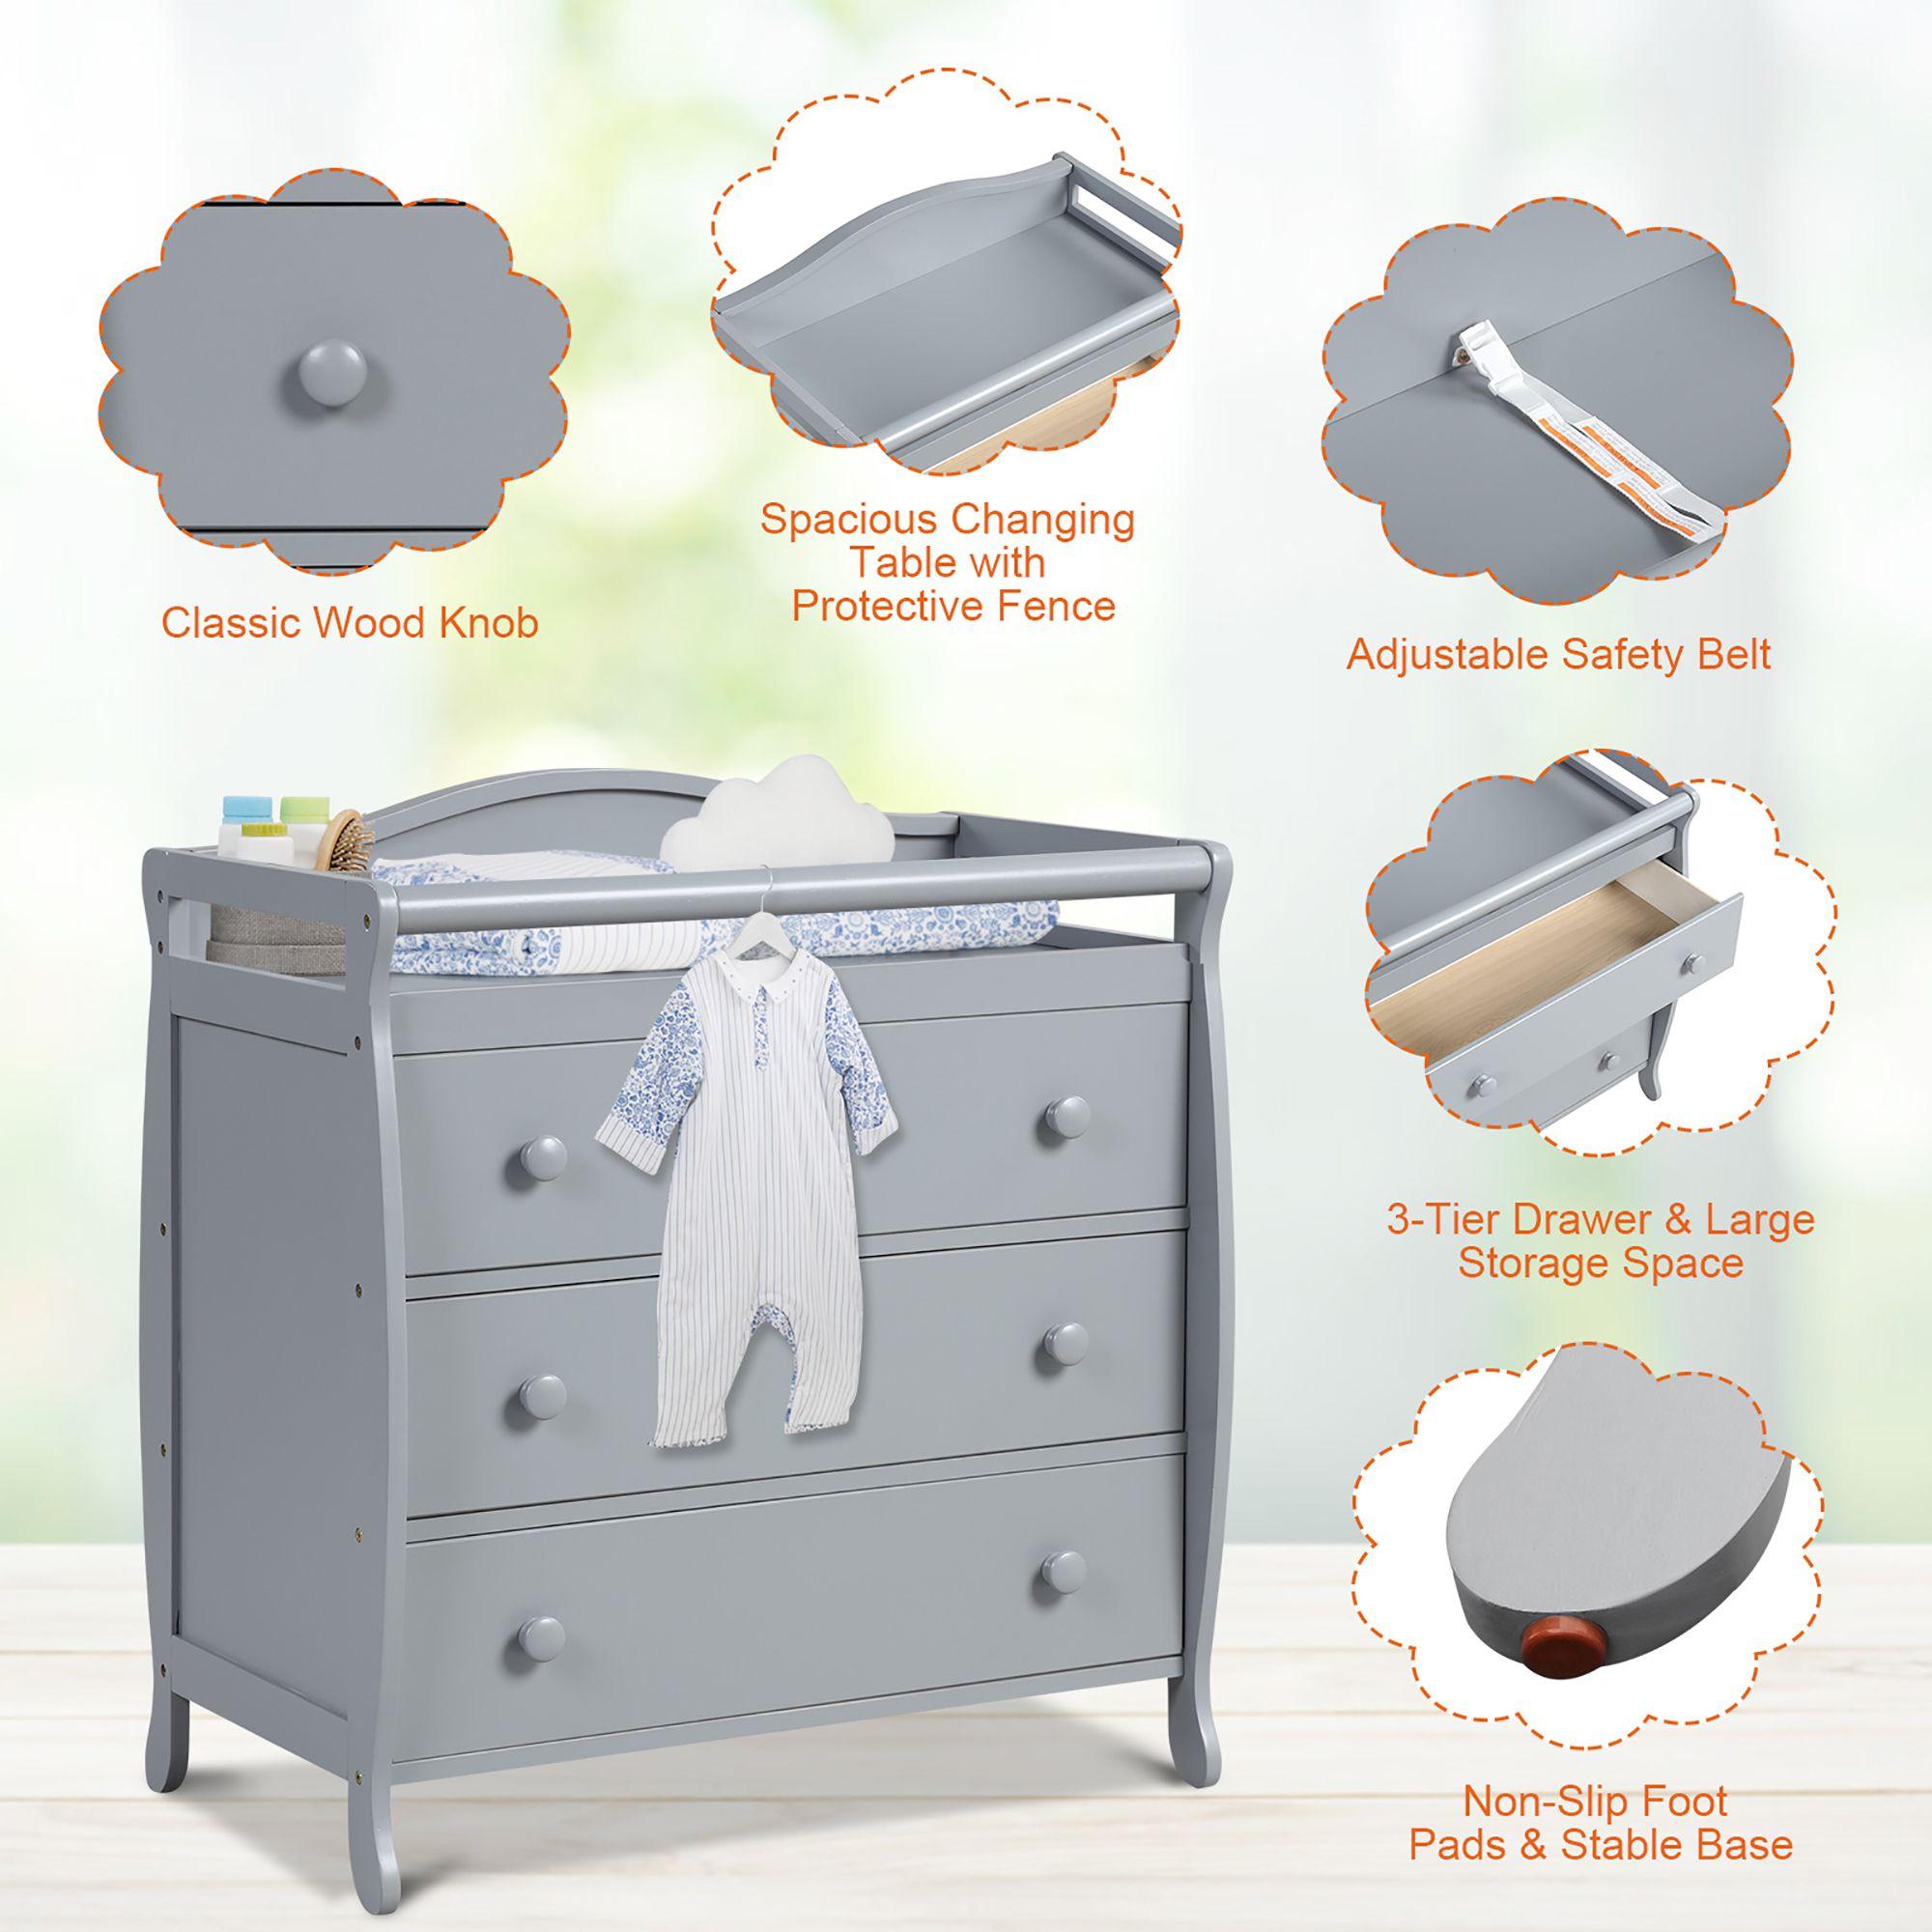 Costway 3-Drawer Dresser Changing Table w/Safety Belt Guardrails for Kids' Room